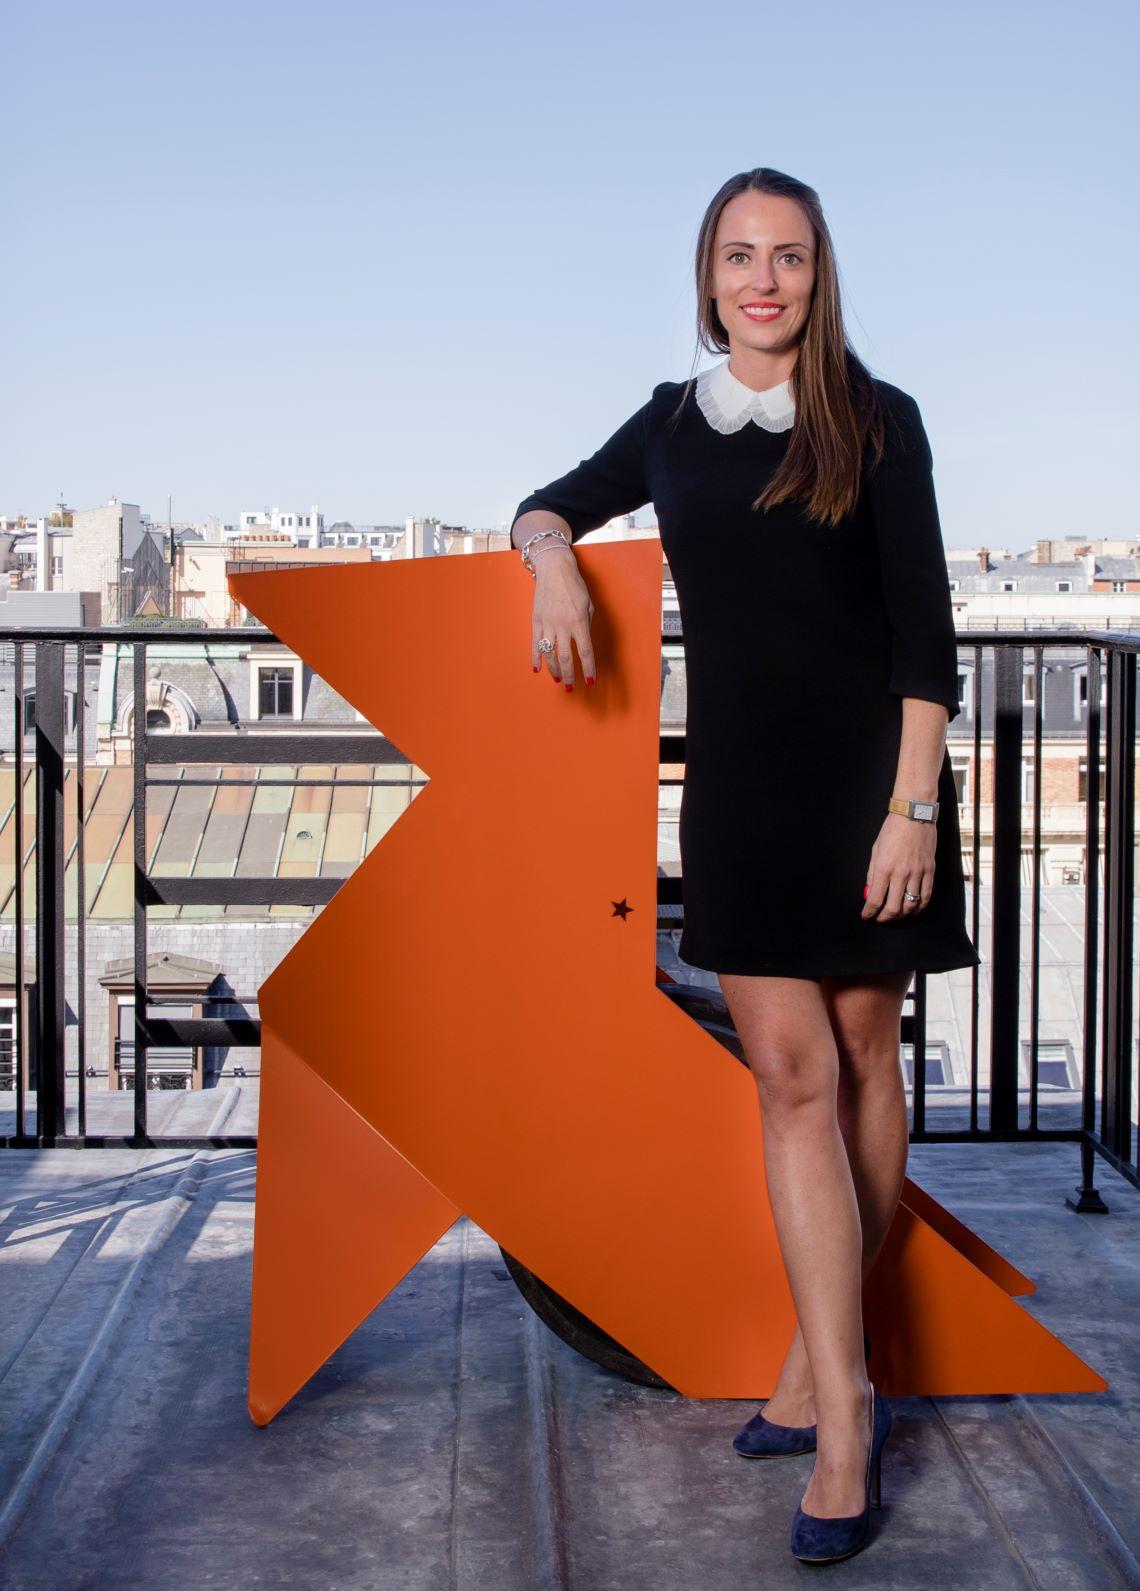 Julie Boucon - (c) Marlene Awaad - Voyez-Vous.